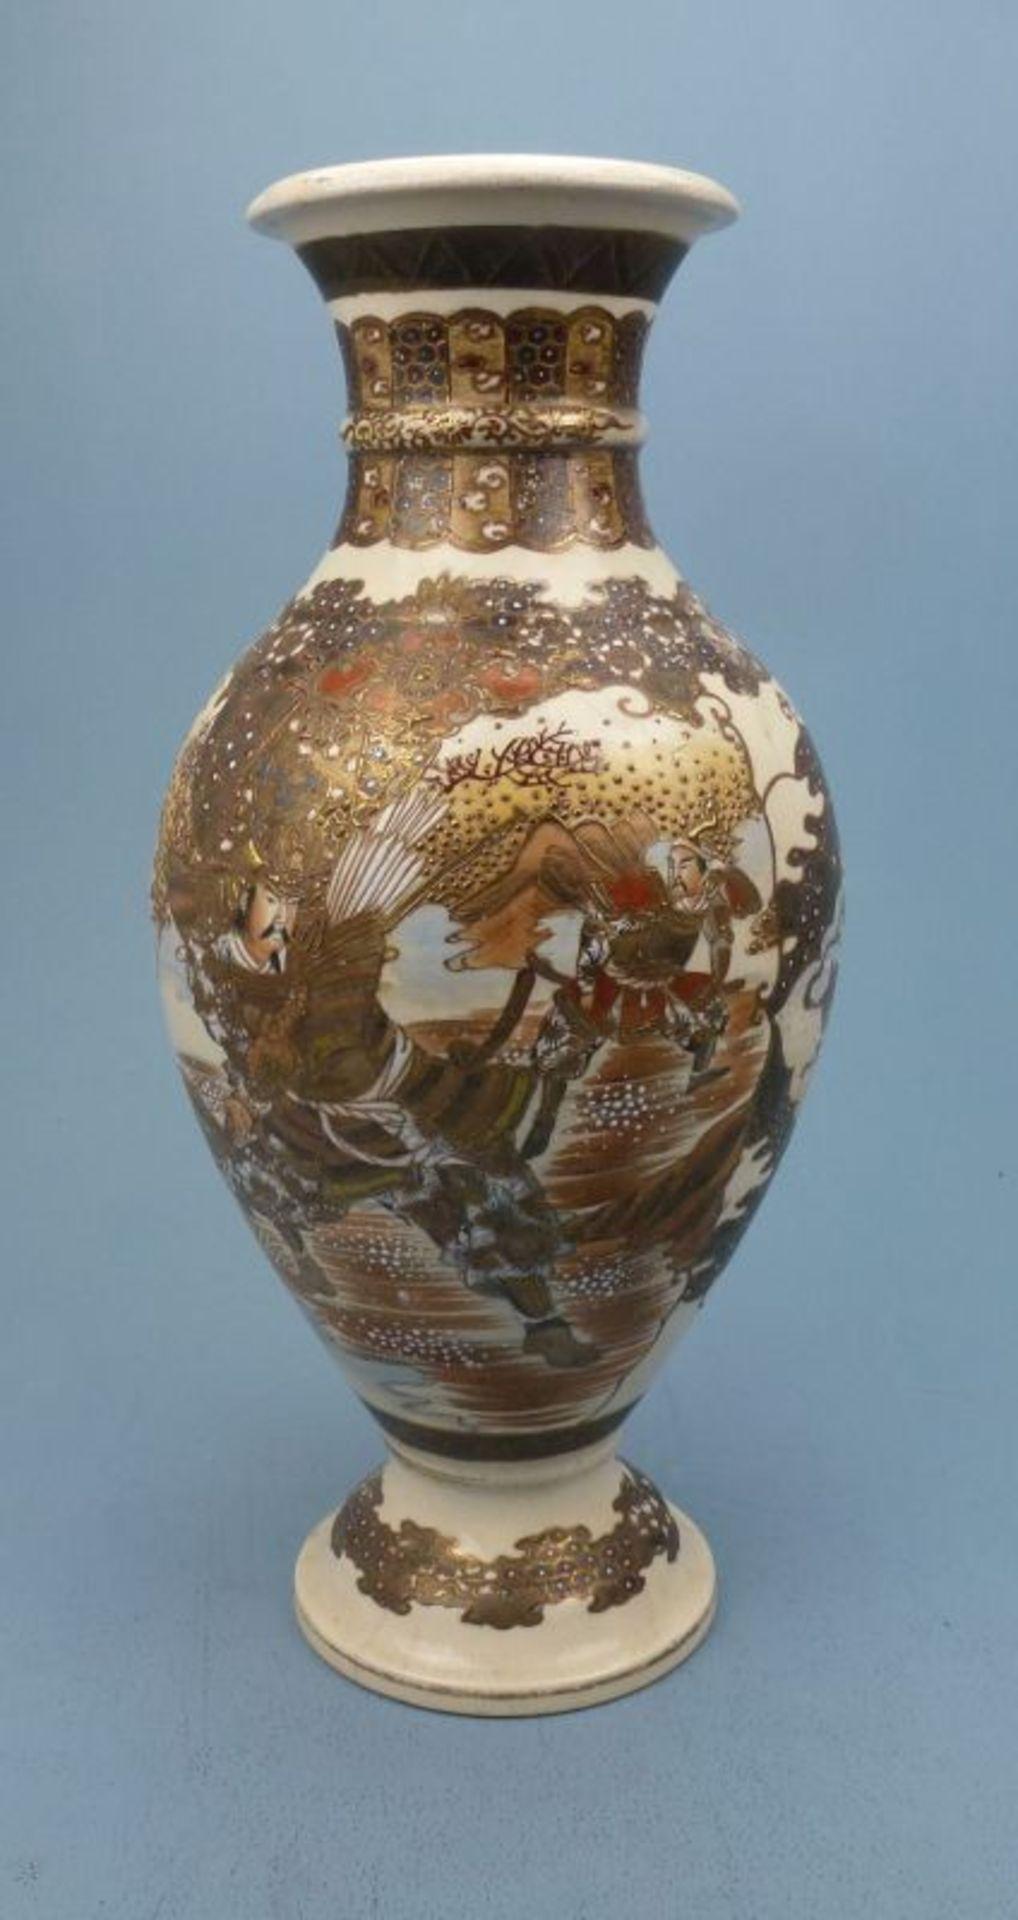 Los 18 - Satsuma - Vase, Japan, Anfang 20.Jh.gefußt ovoid, Krieger bzw. Edelleute in Tracht, Chip u.